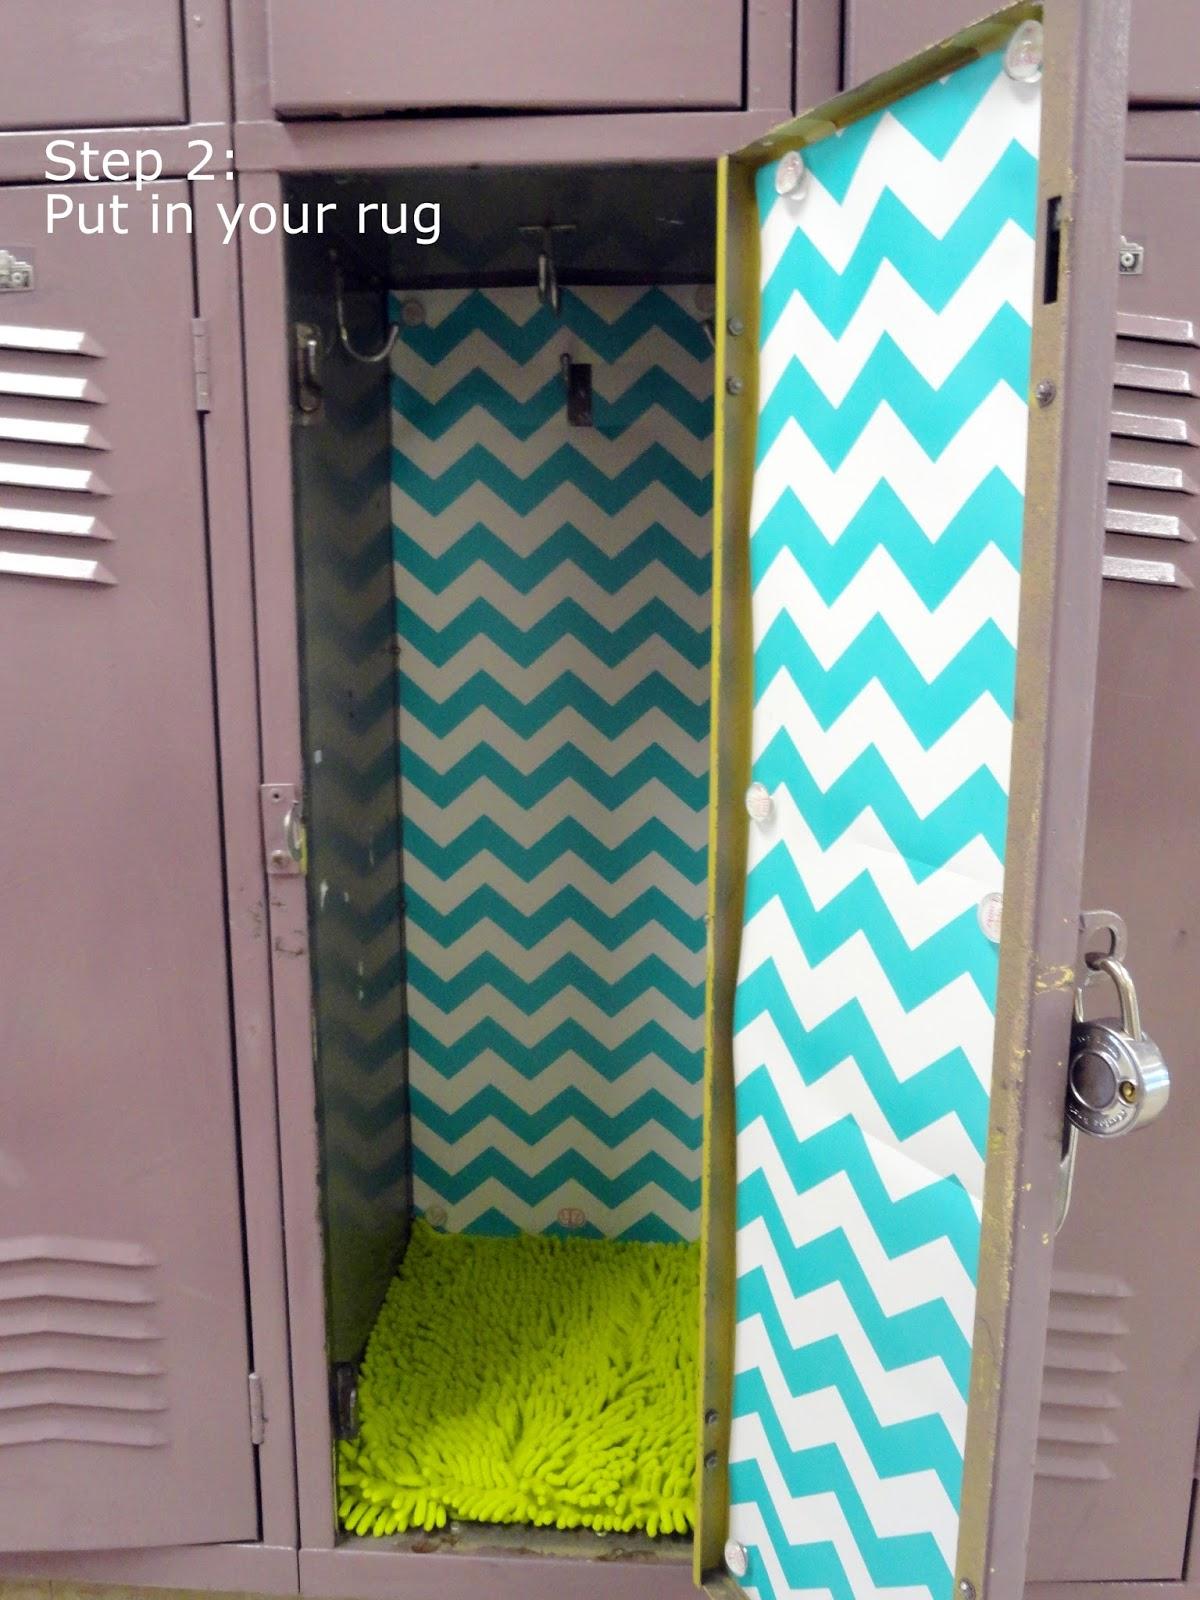 5 simple steps to decorating a fabulous locker with Locker Lookz - Rachel Teodoro